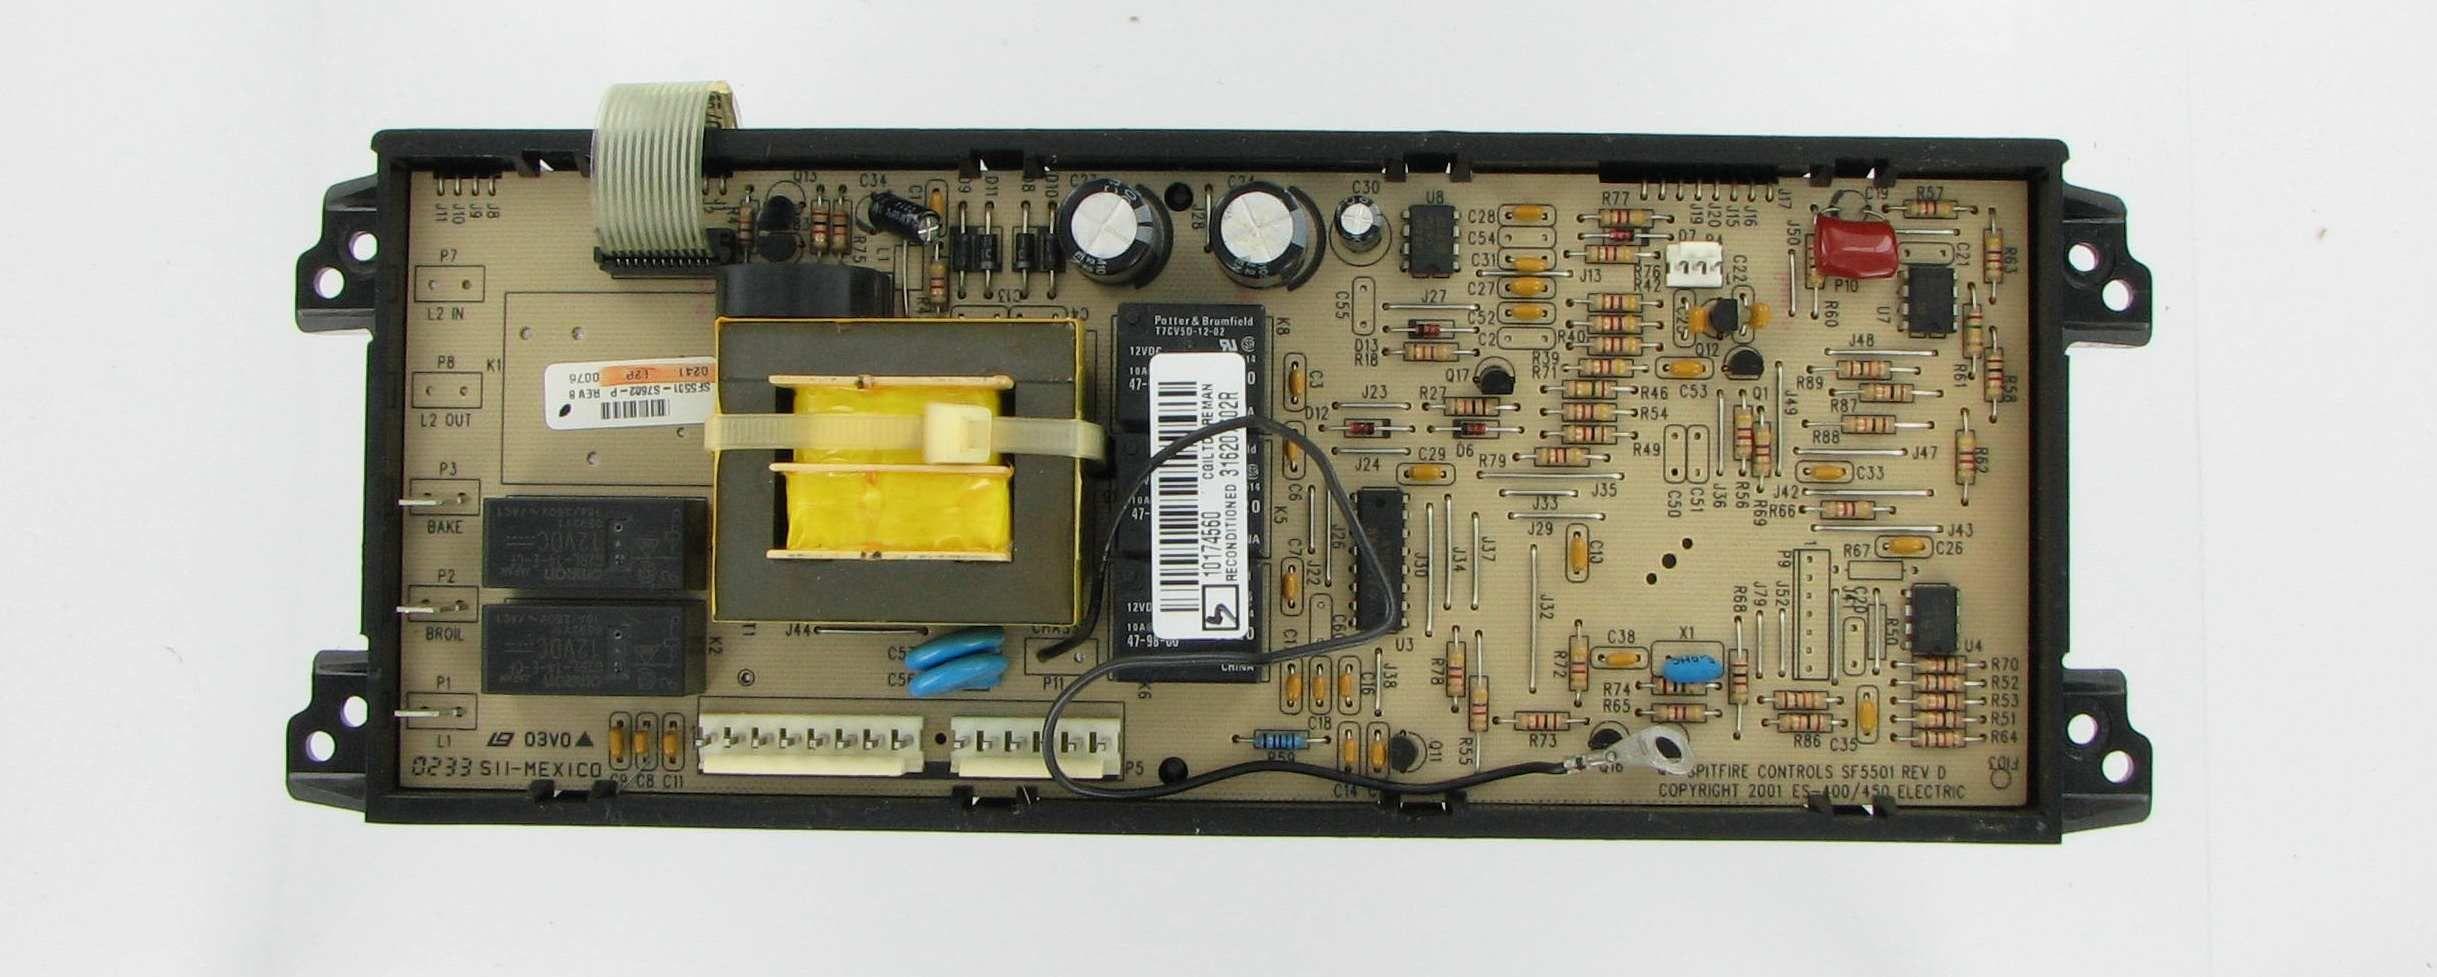 Frigidaire 316207602 Range Oven Control Board And Clock Frigidaire Oven Range Broken Appliance